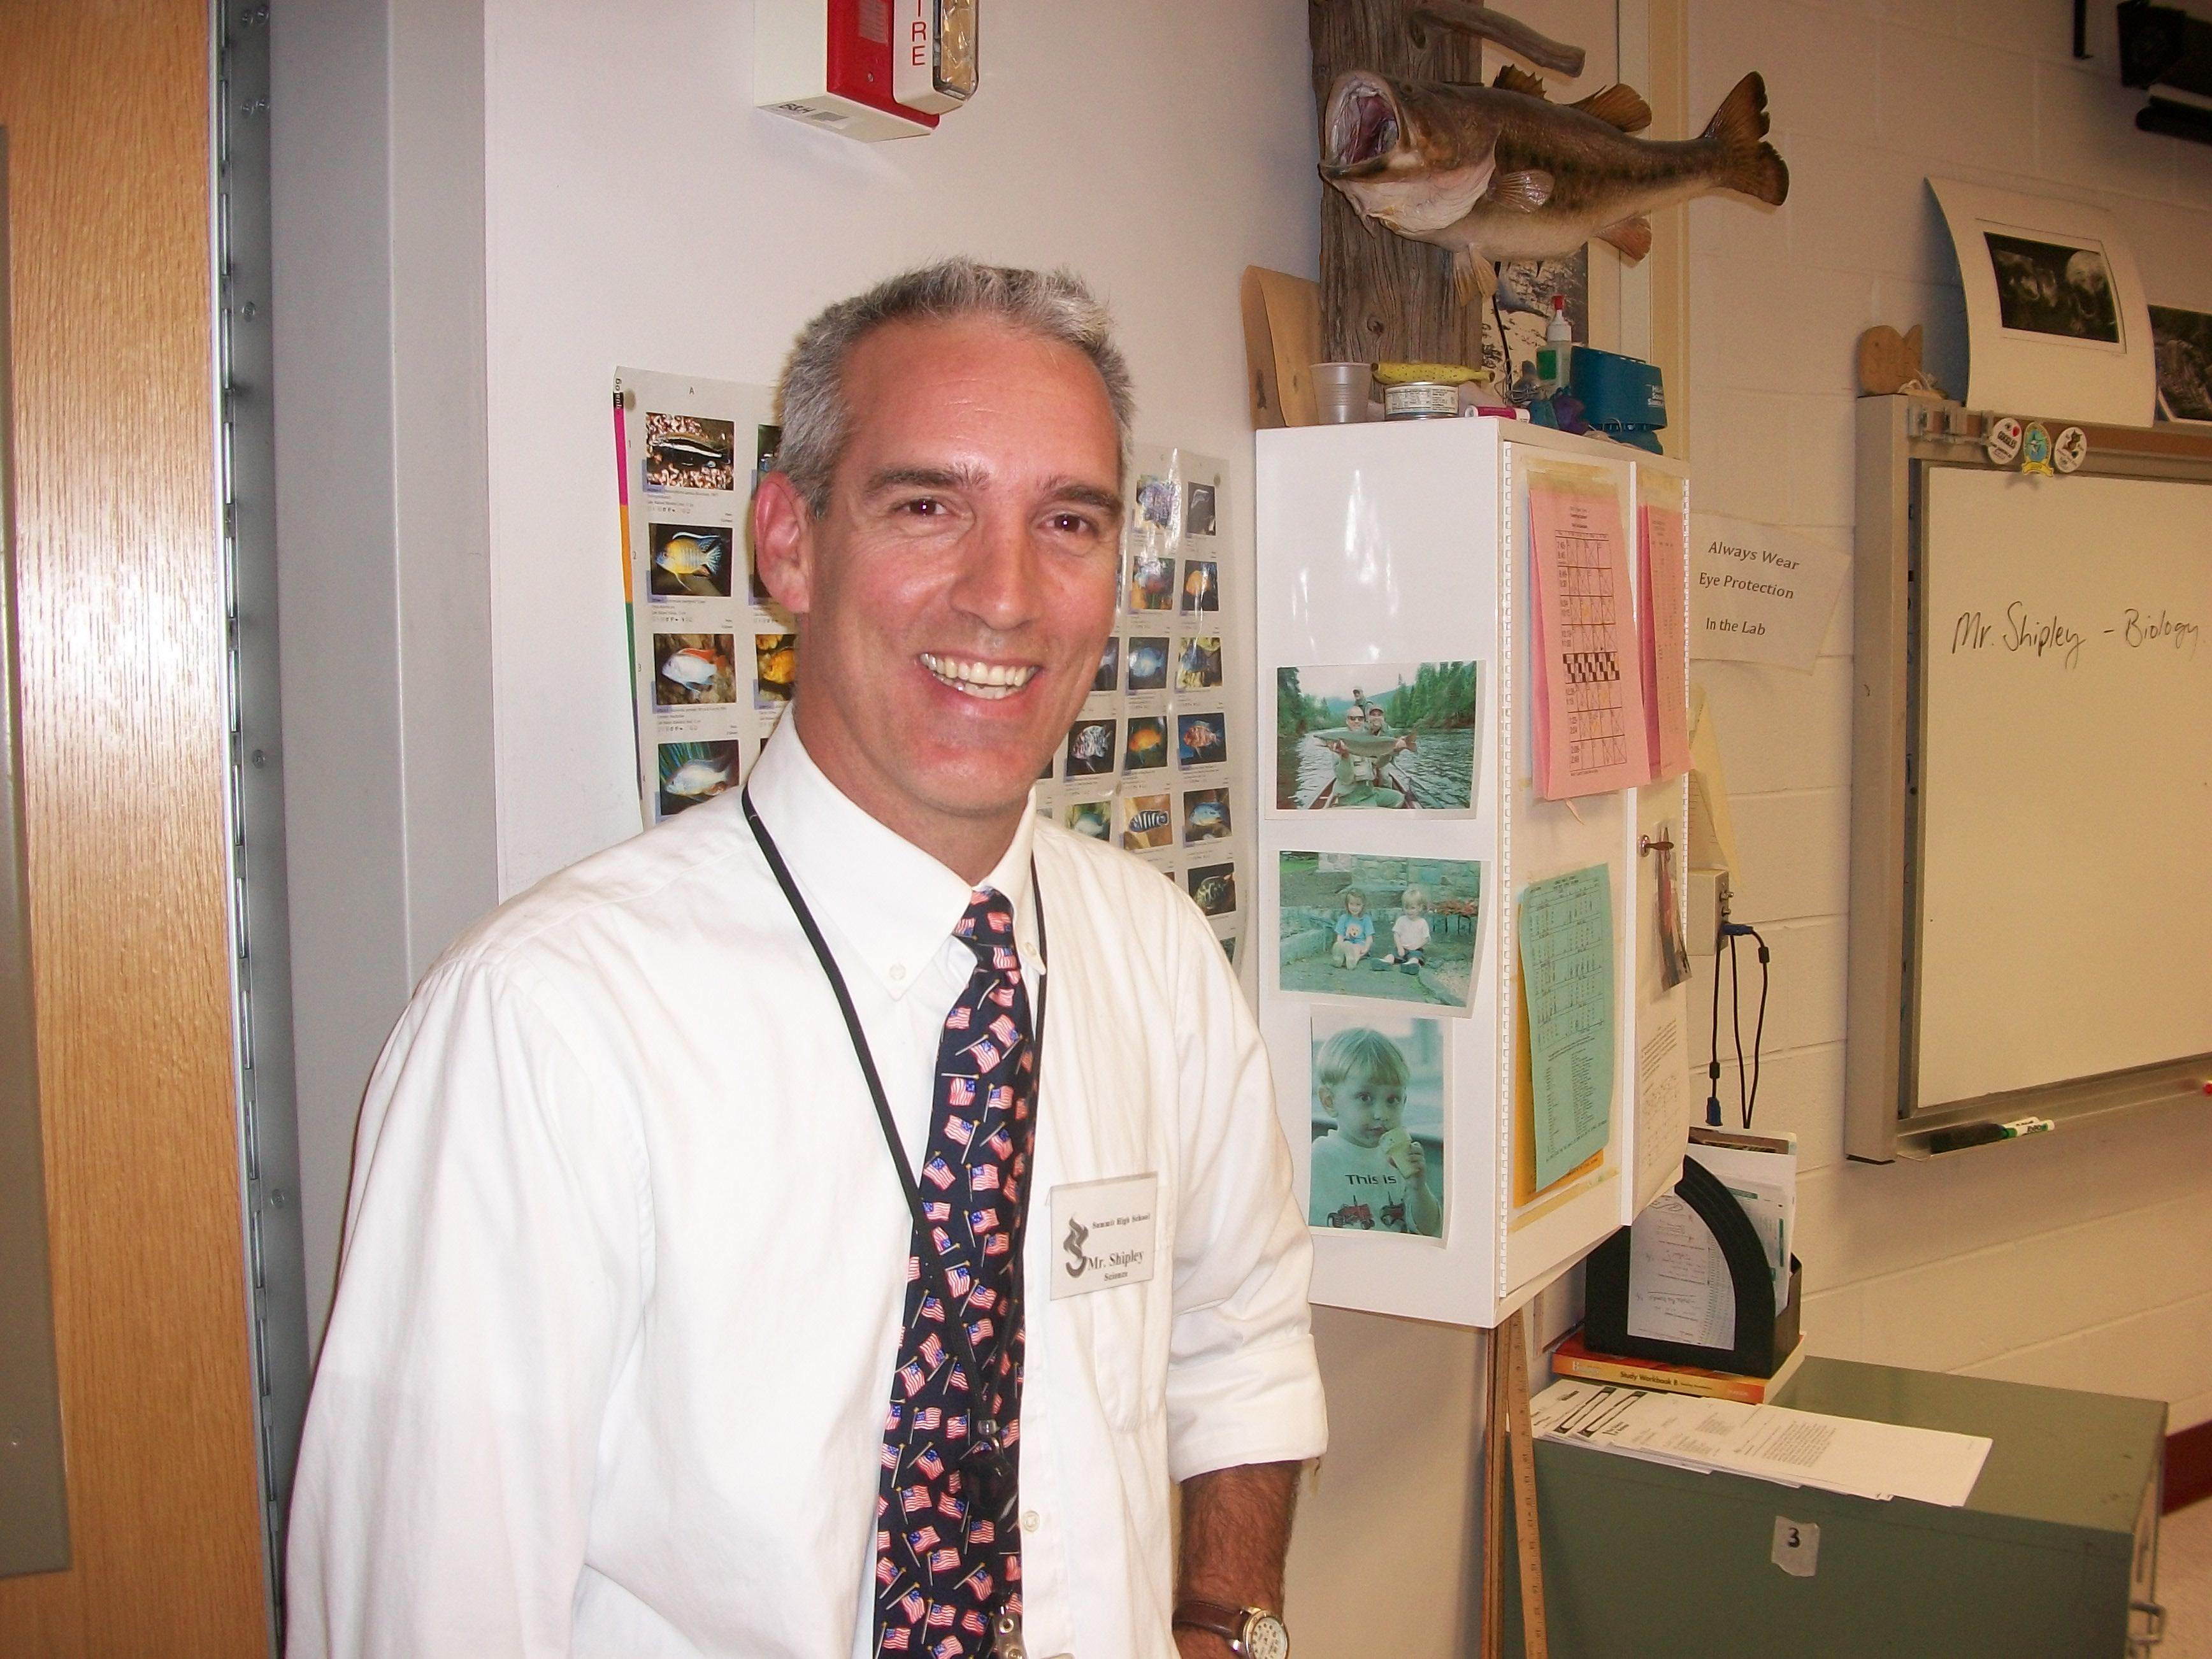 File:Summit High School Science Teacher John Shipley.jpg ...